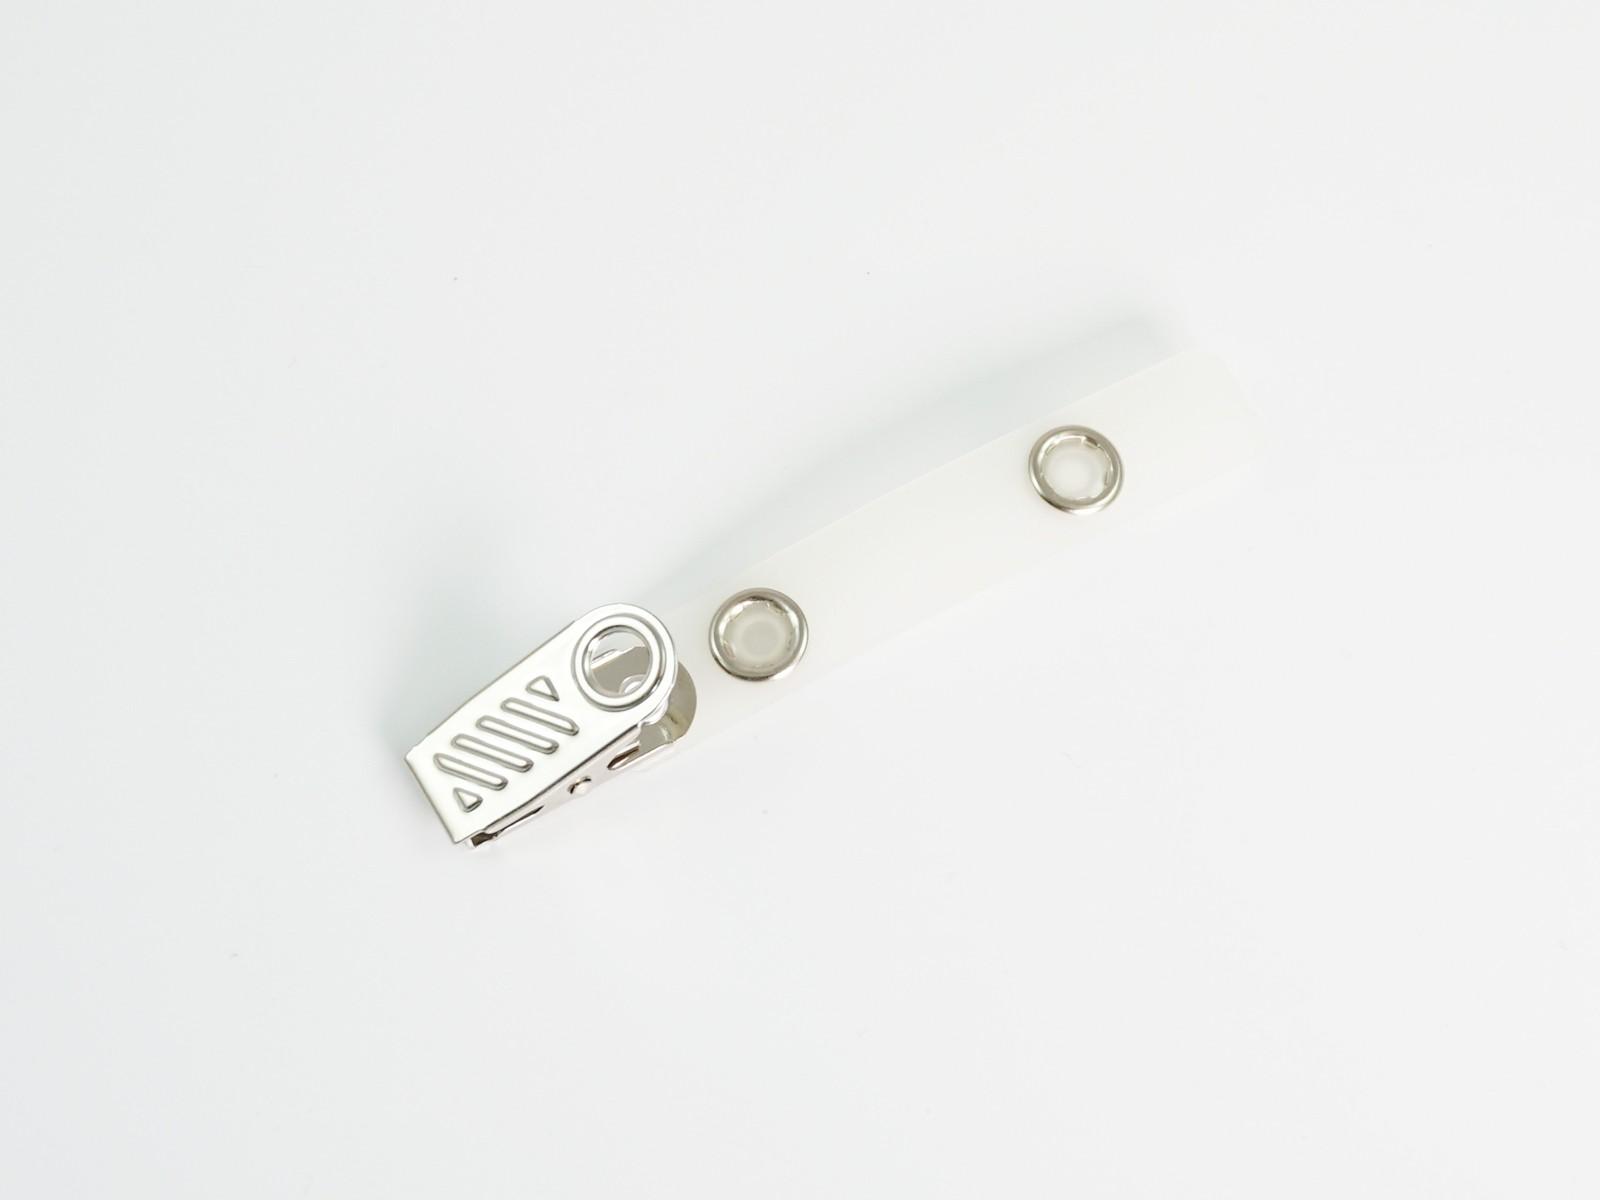 Metal Clip Clear Swivel Strap, 50pc/bag